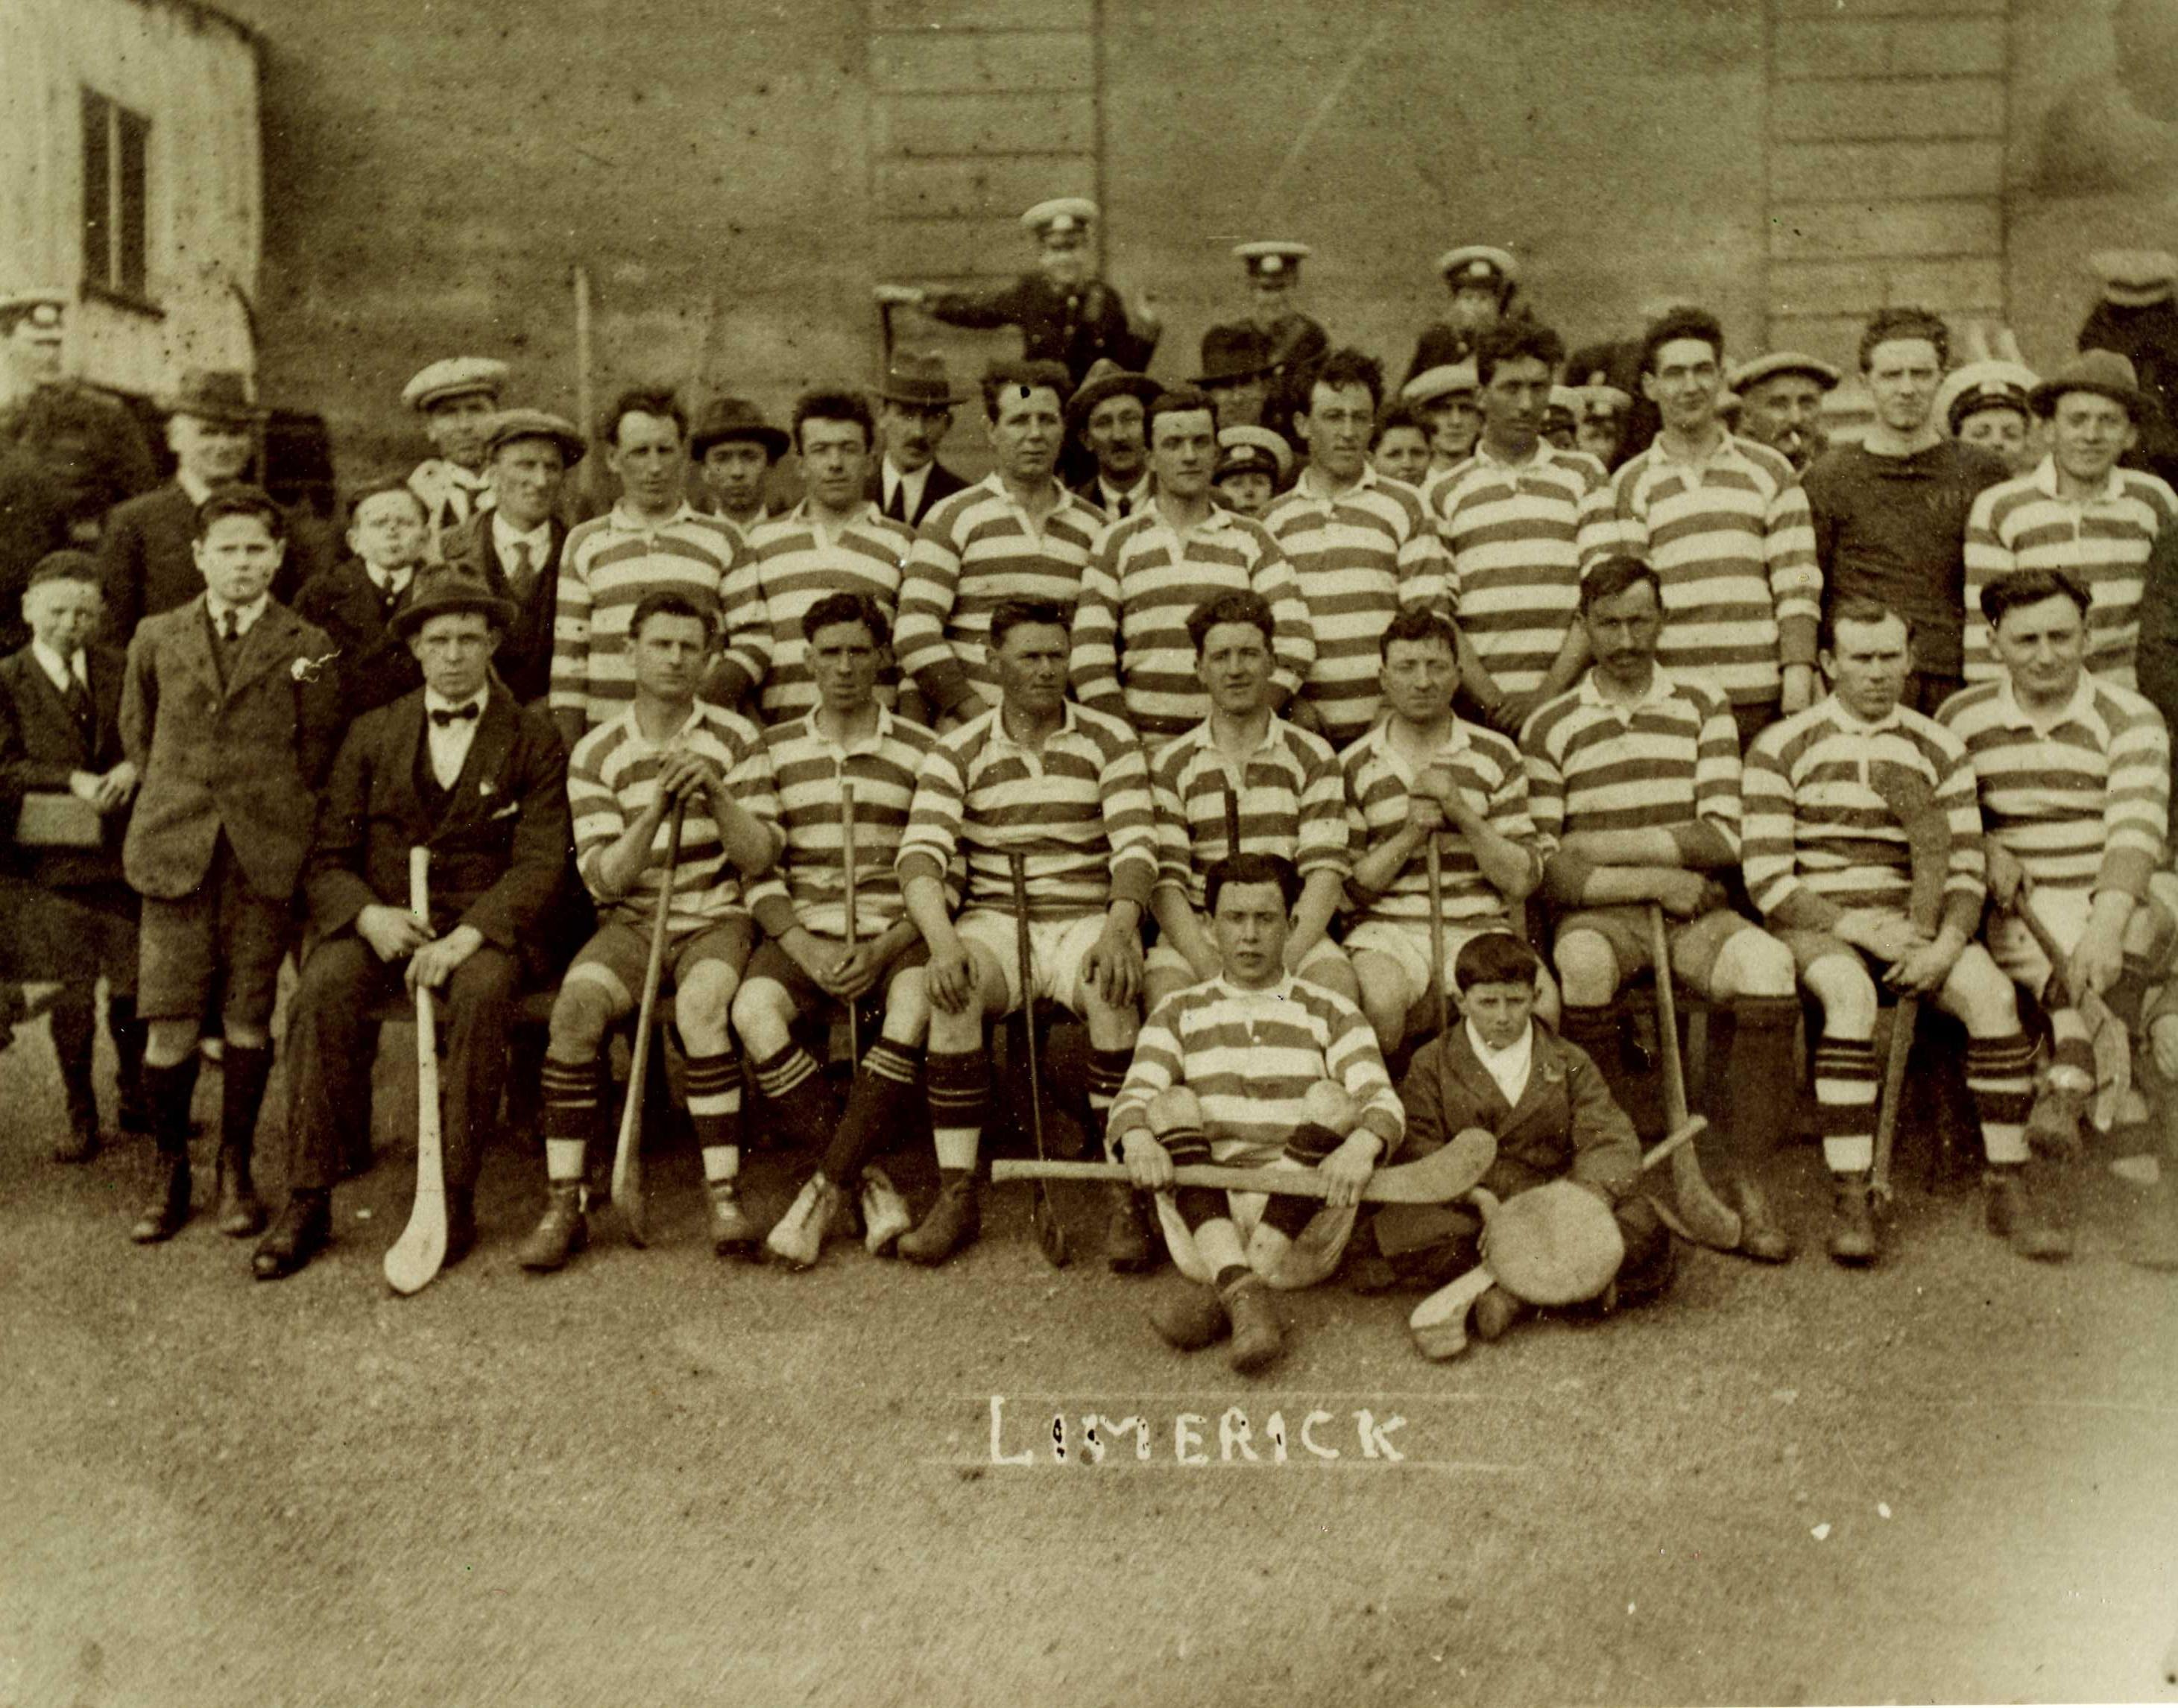 Limerick 1921 Hurling All-Ireland Champions